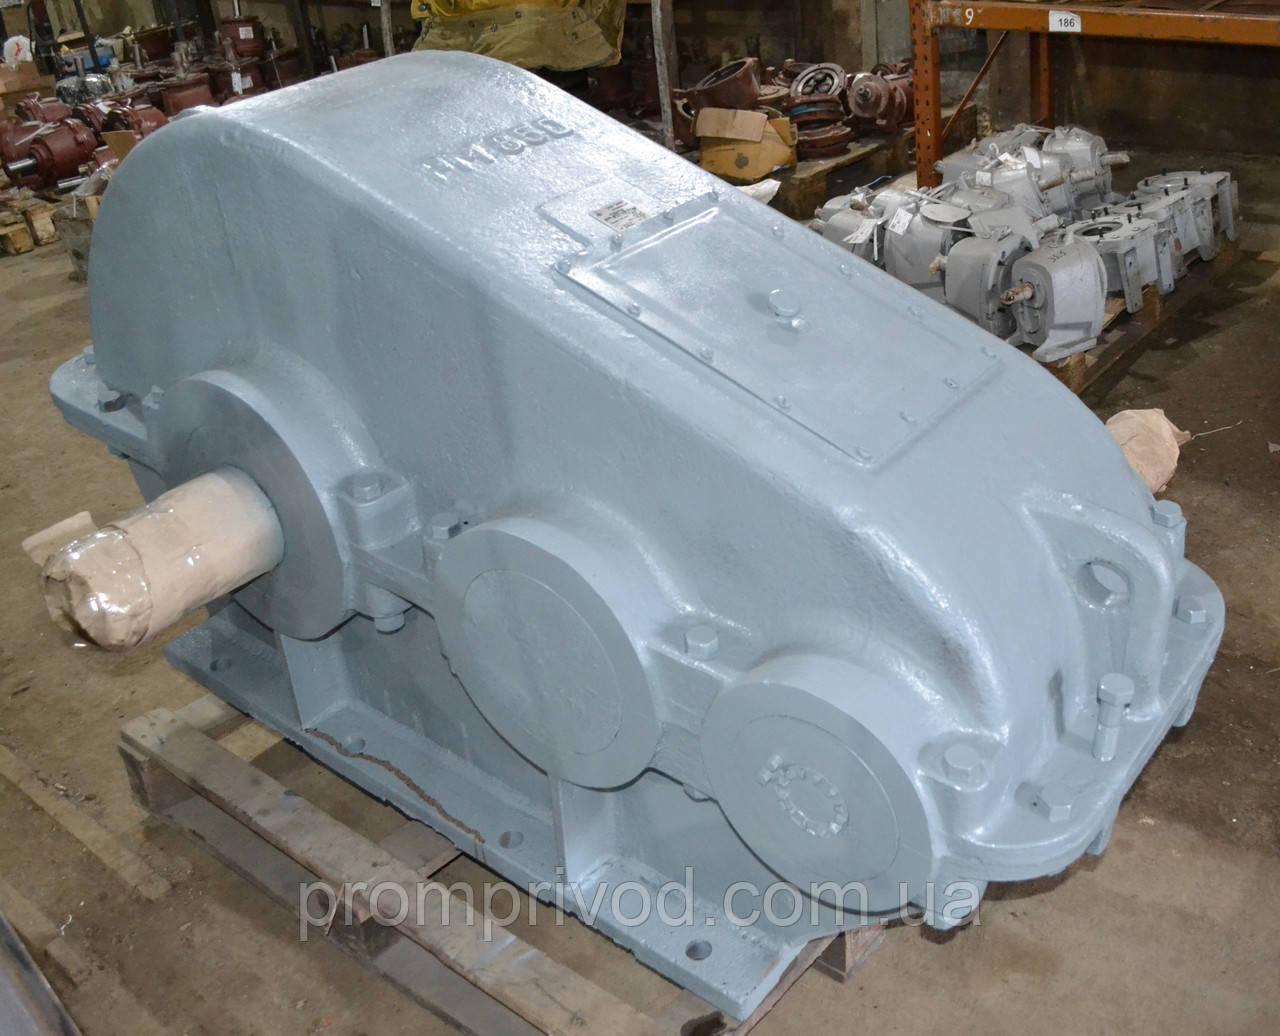 Редуктор РМ-850-12.5-22